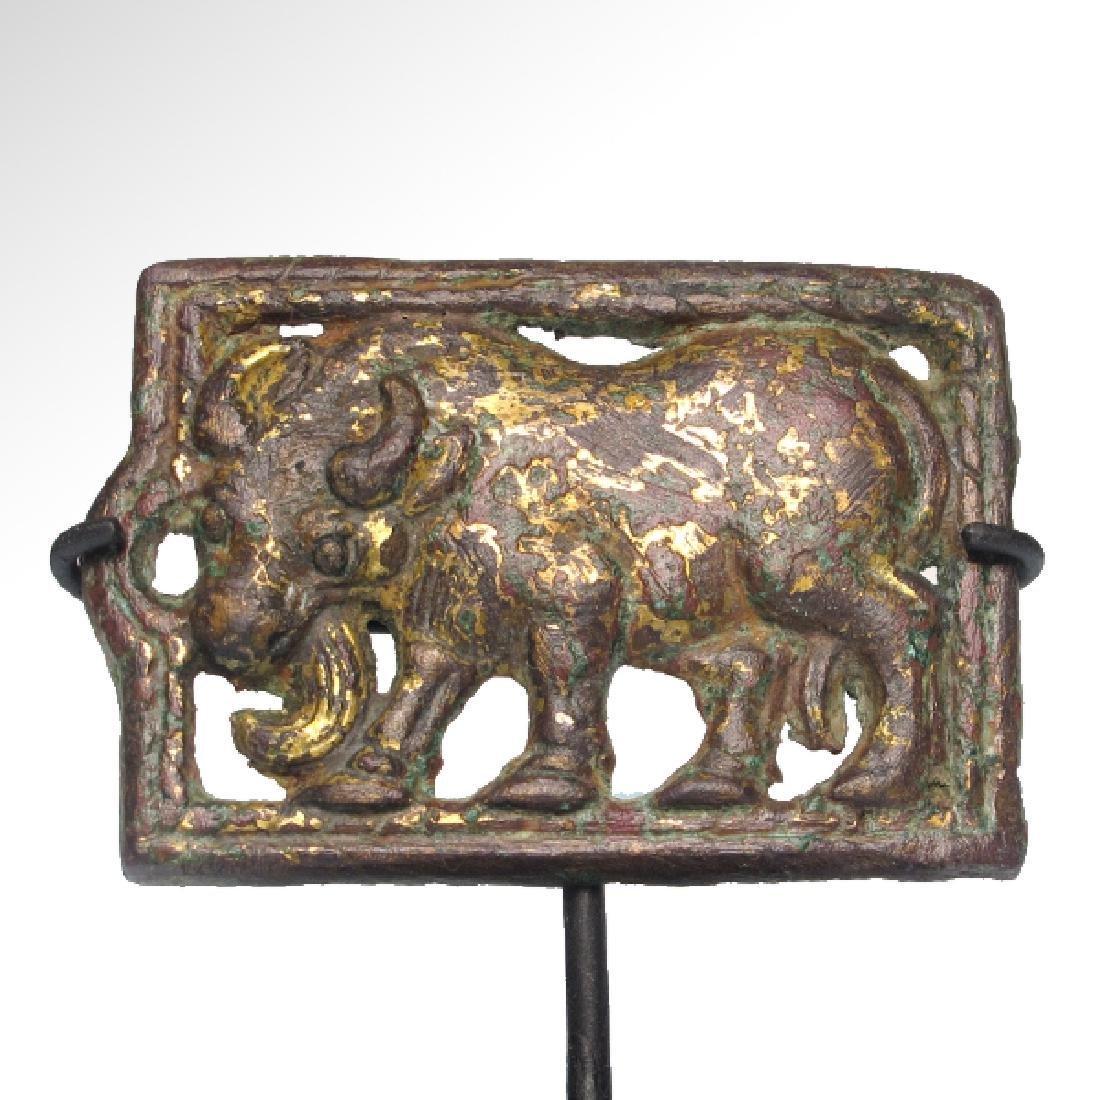 Ordos Gilt Bronze Open-Work Plaque with Bull, c. 500